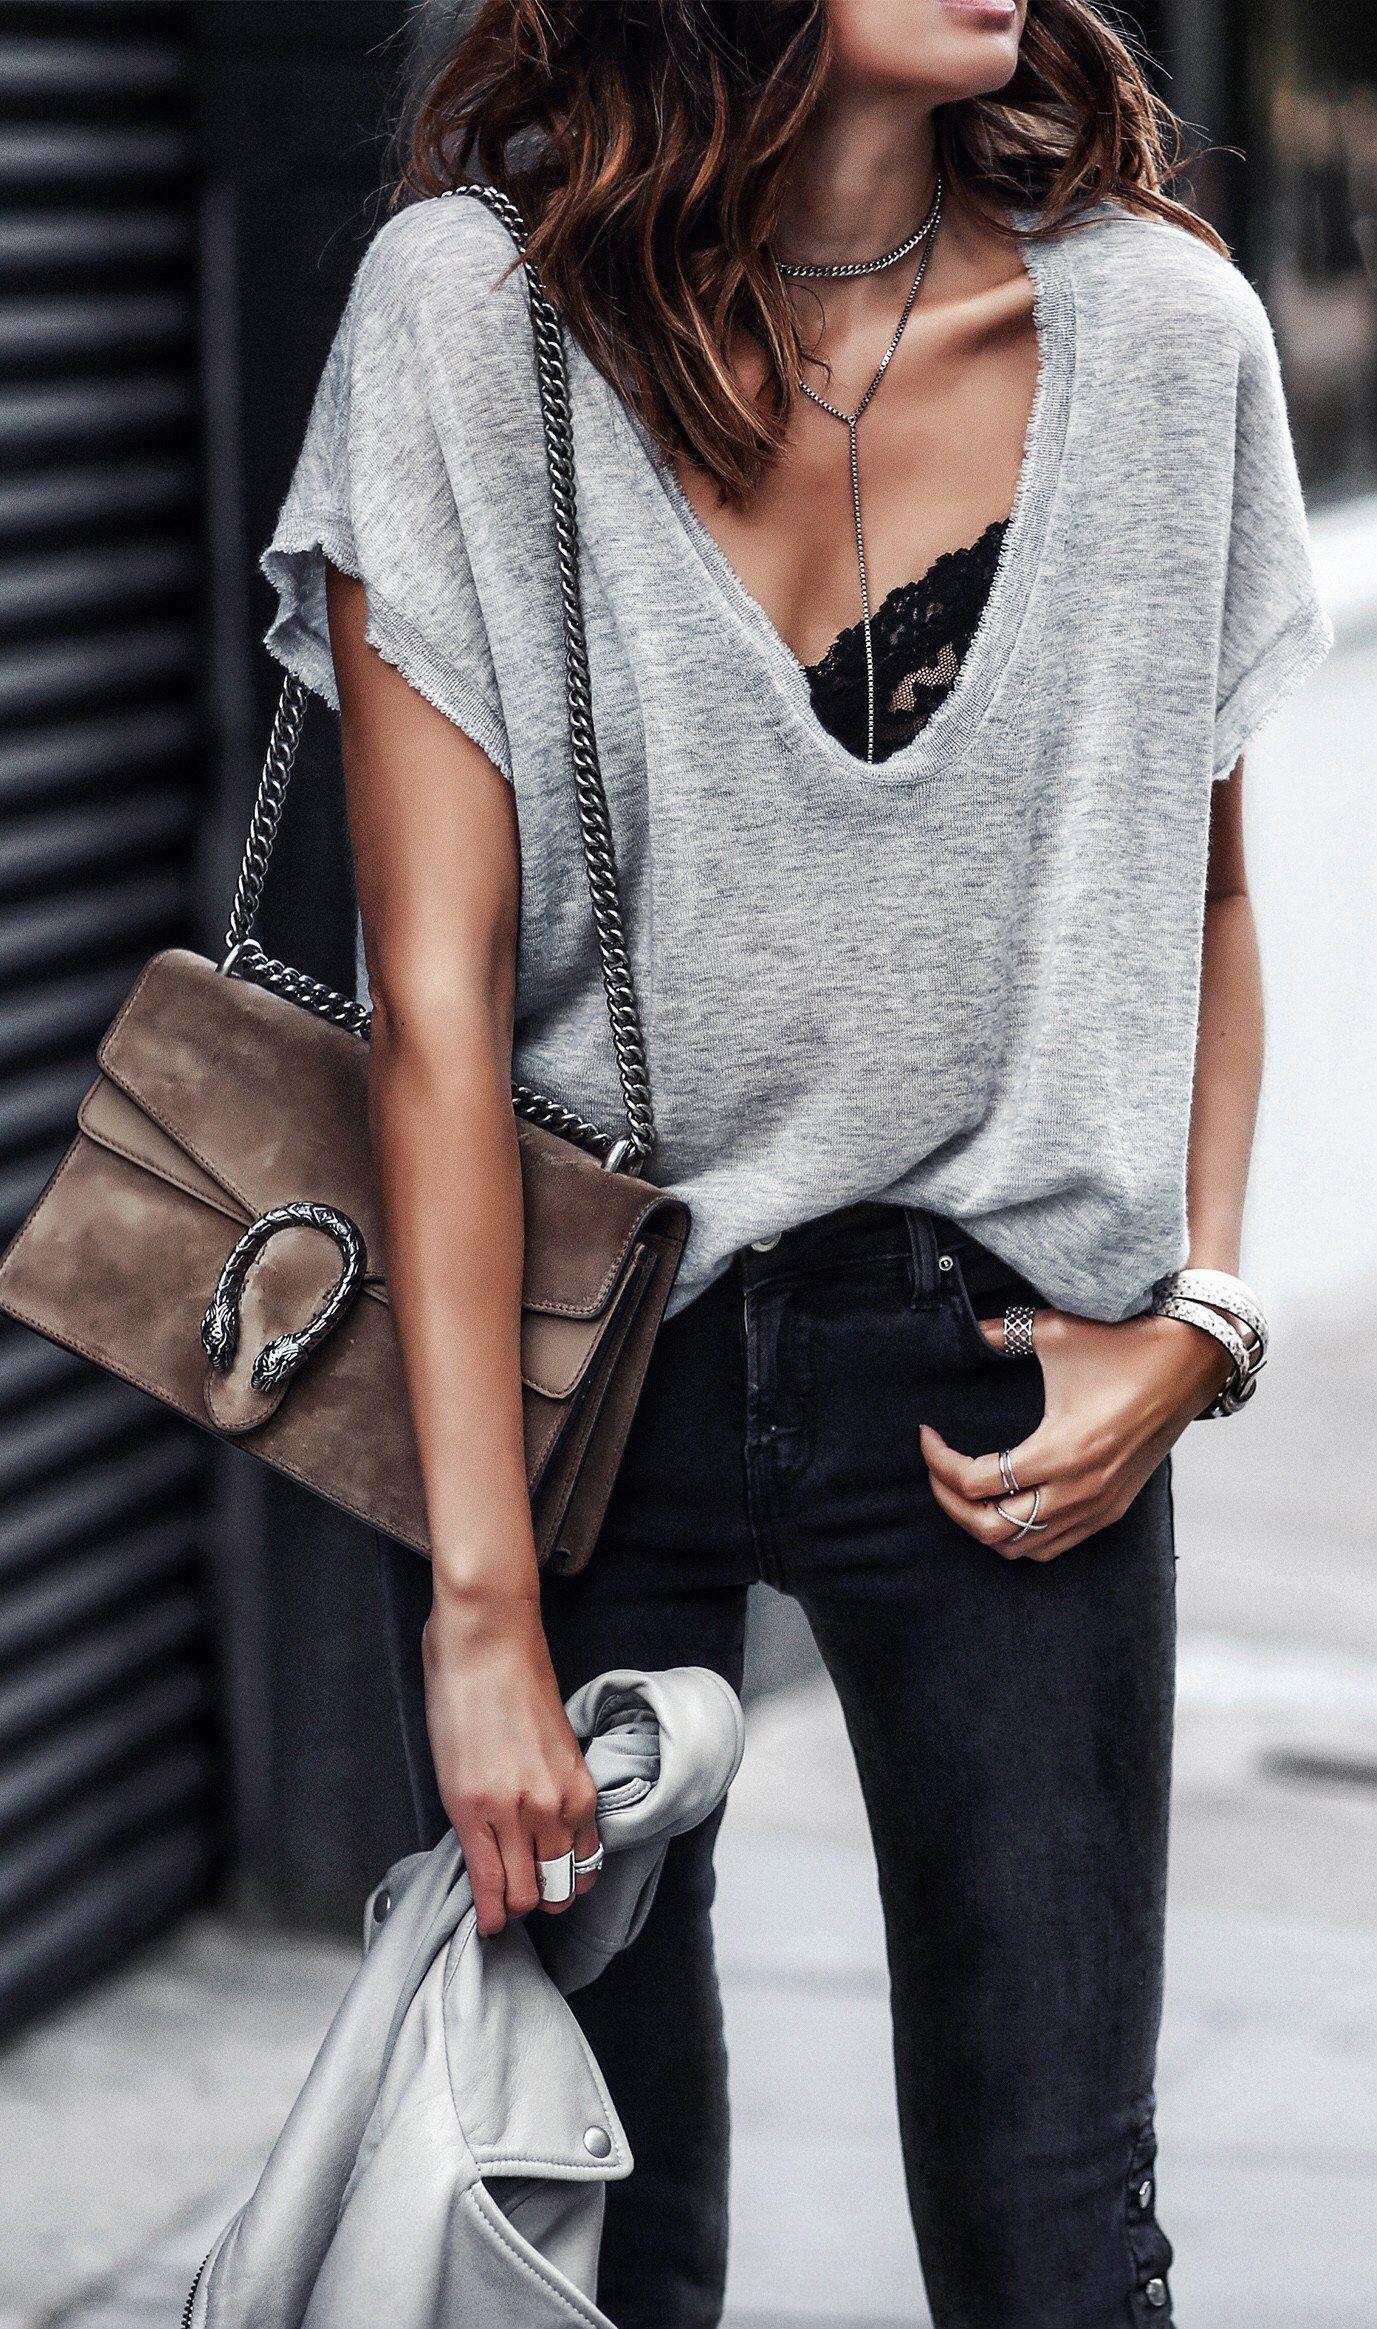 outfits summer gris con cuello en v t negro vaqueros. Black Bedroom Furniture Sets. Home Design Ideas